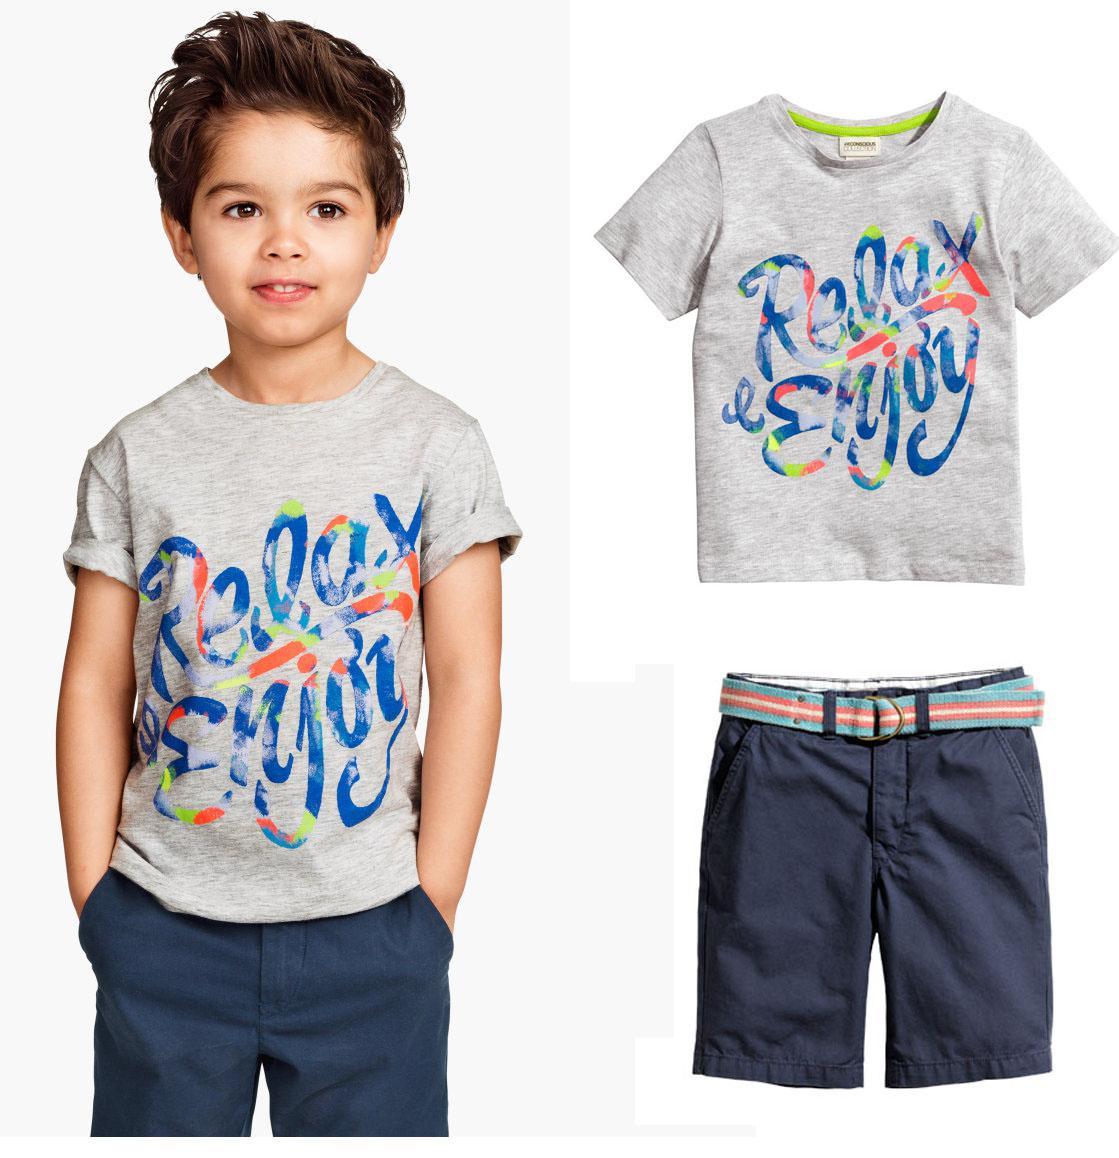 Wholesale Baby Boys Summer Clothing Sets Boy Brand